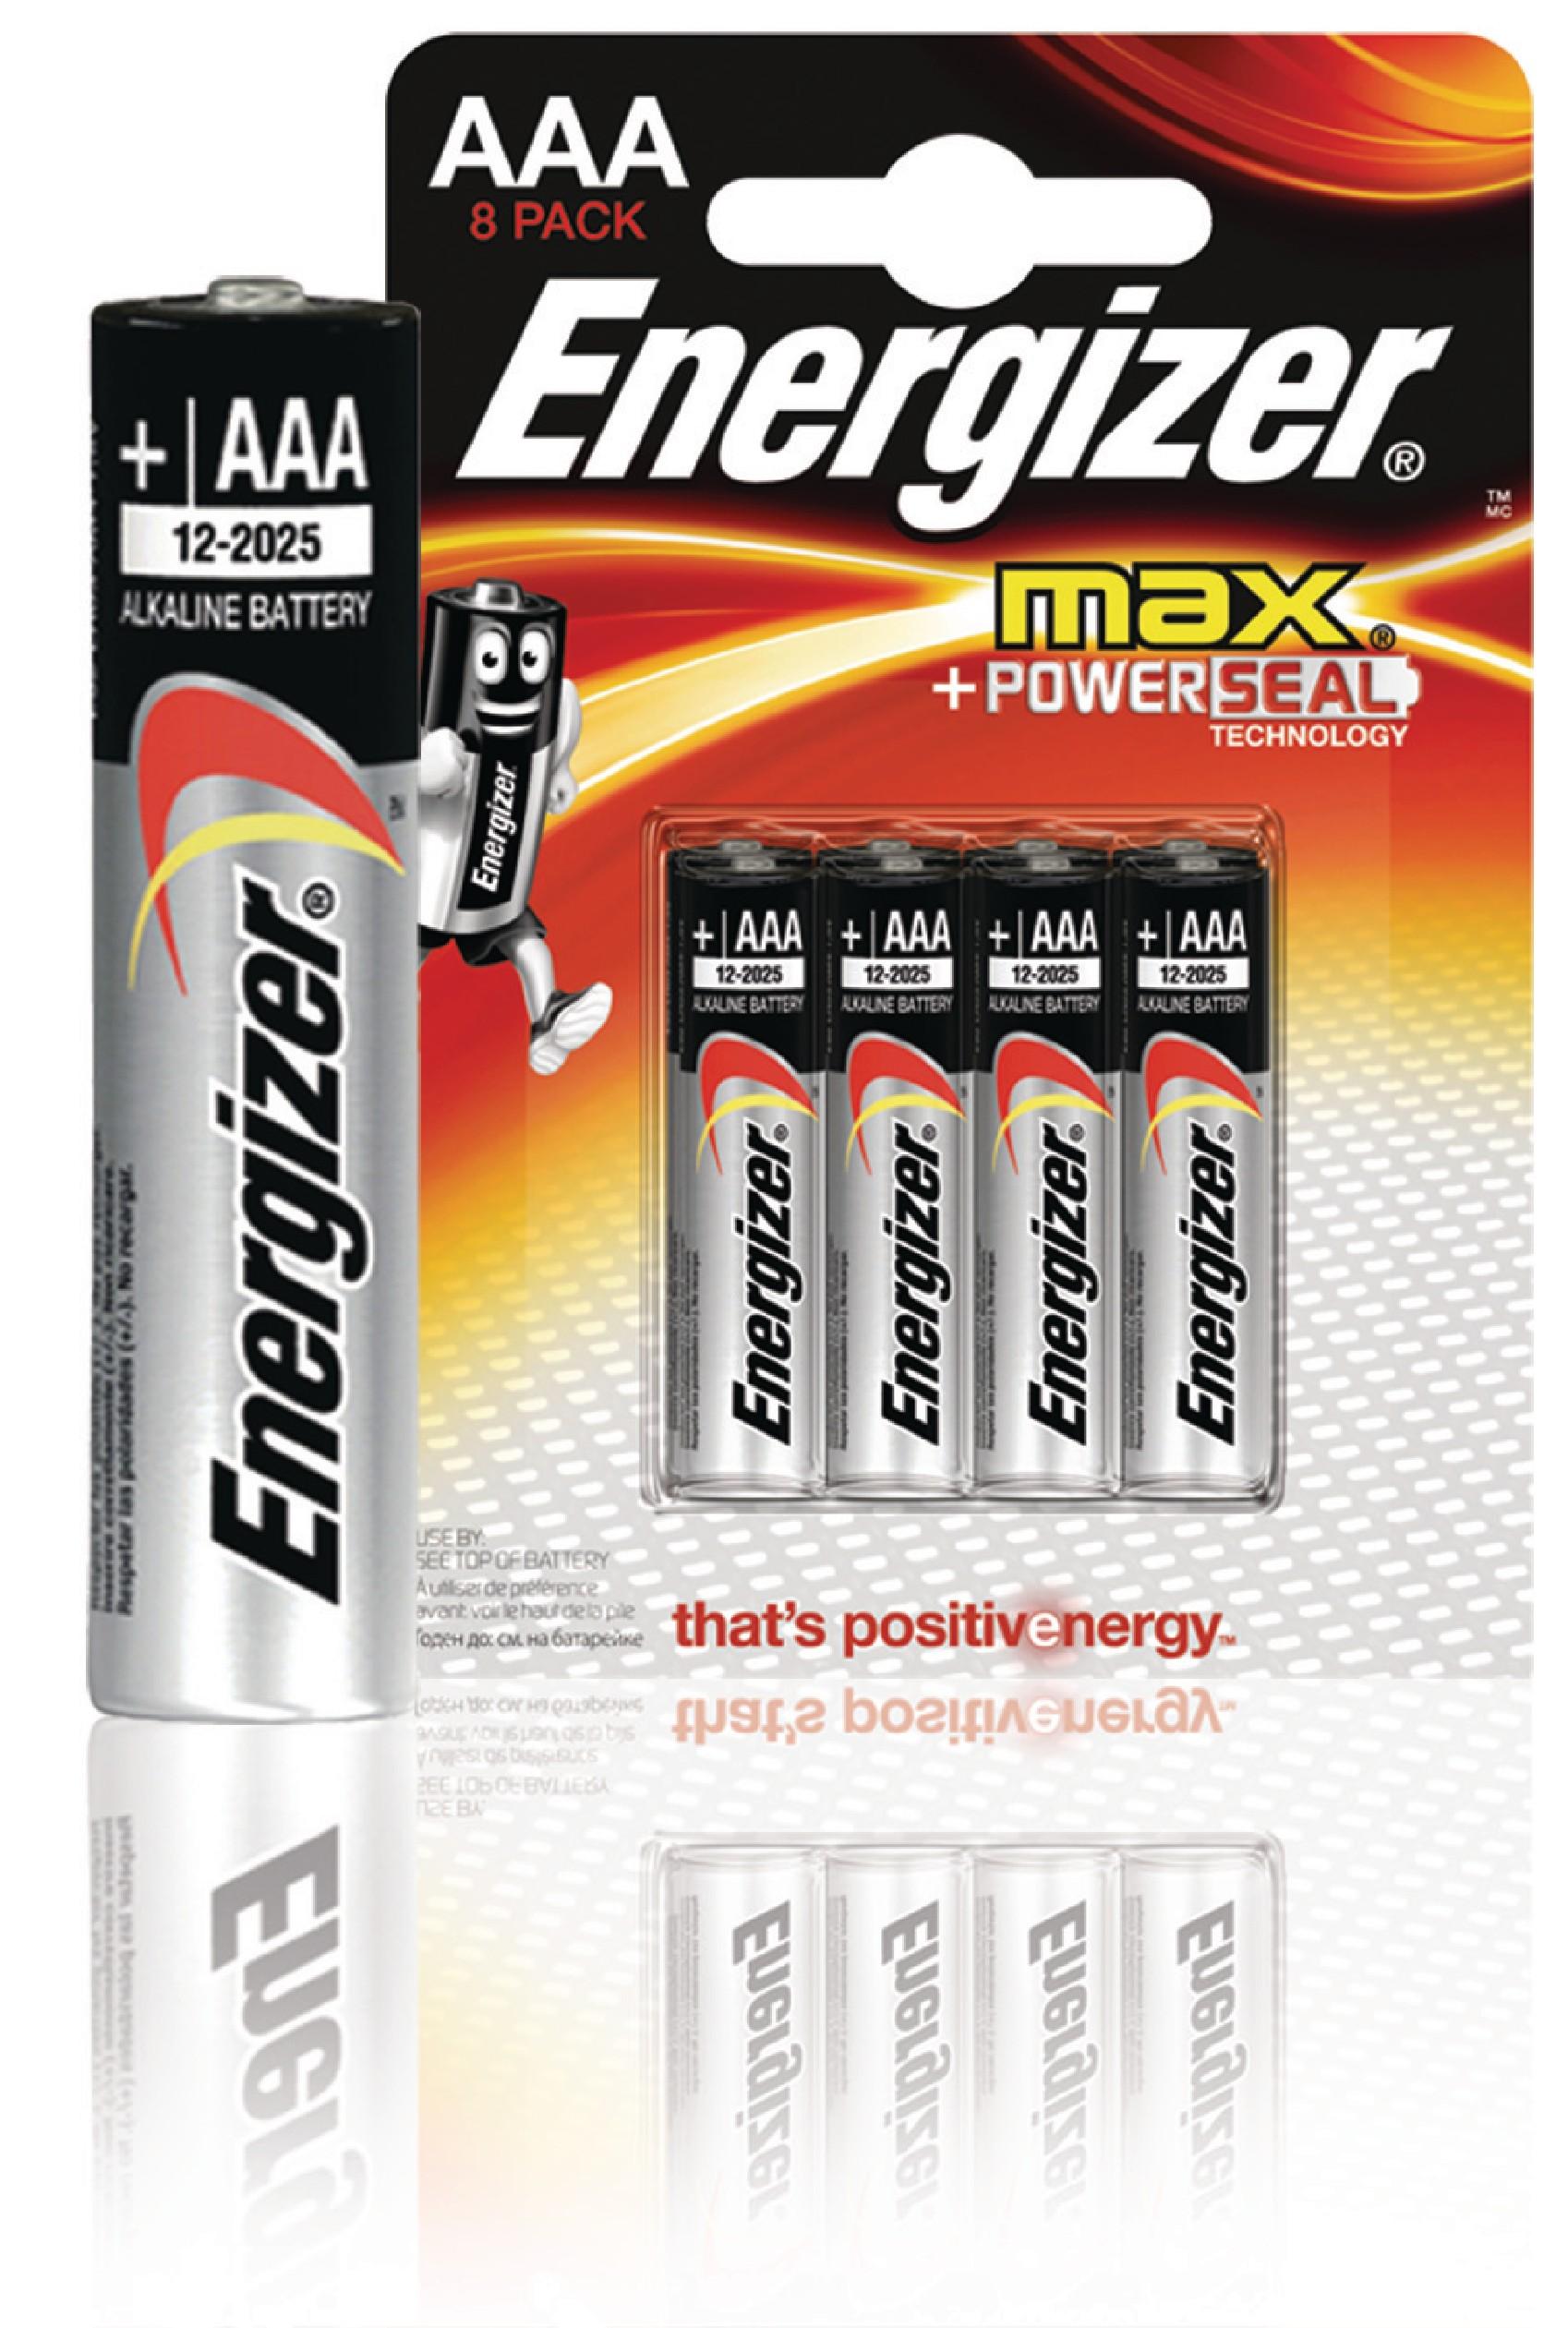 Alkalická baterie Energizer Max AAA 1.5V, 8ks, EN-53541022800